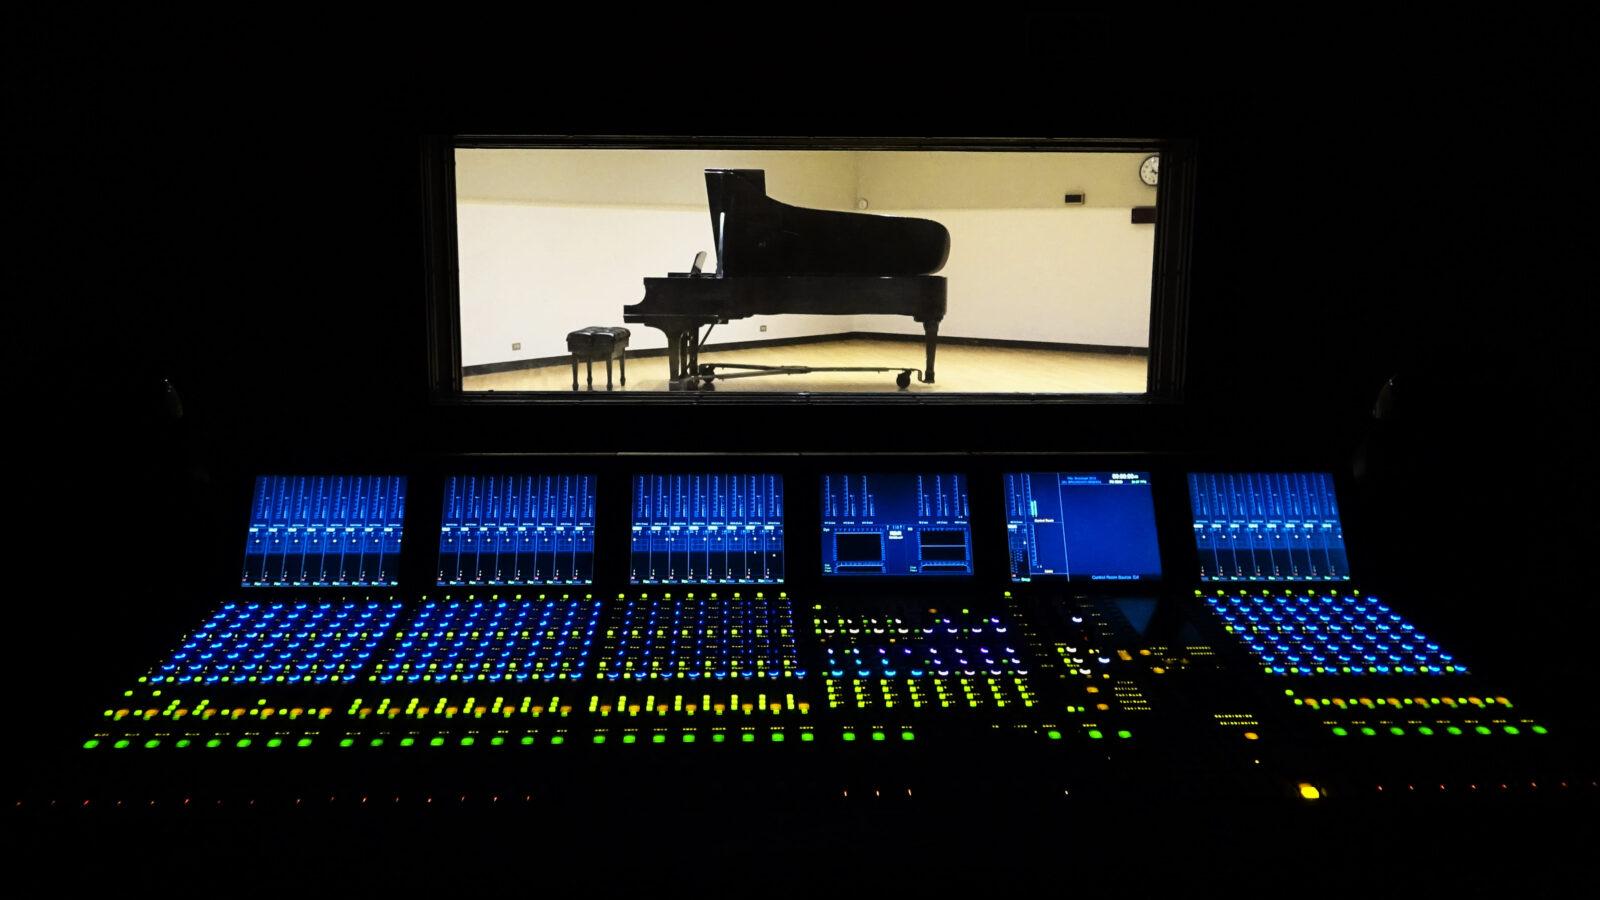 WFMT Radio Control Room